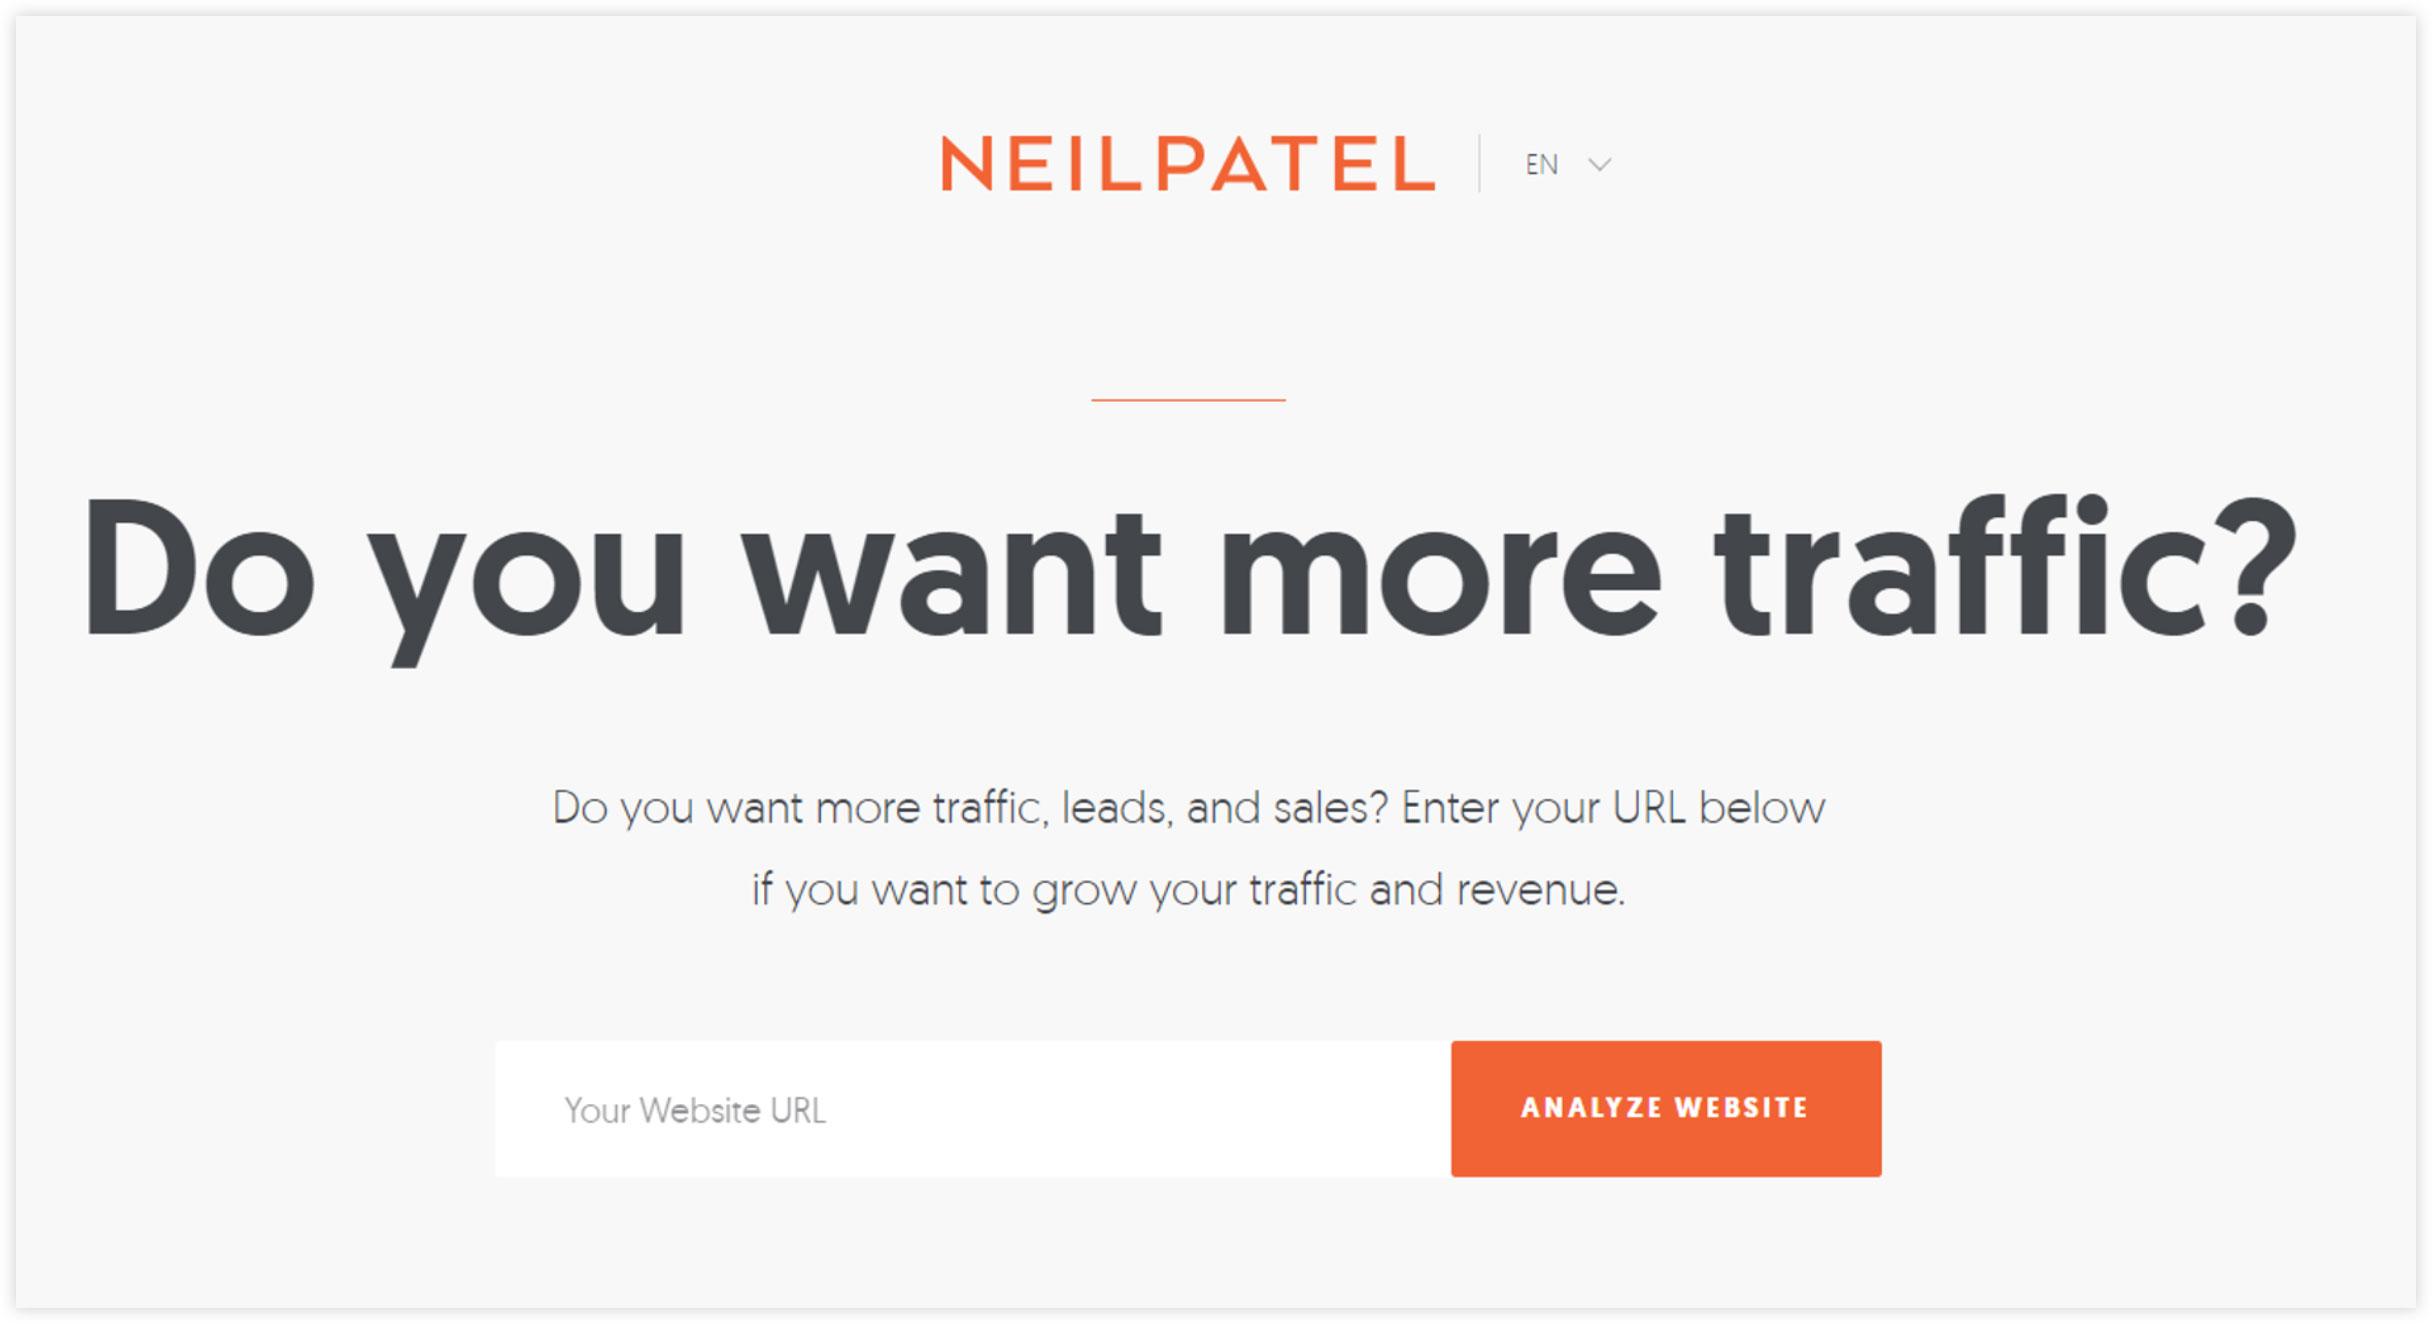 Affiliate Expert - Neil Patel